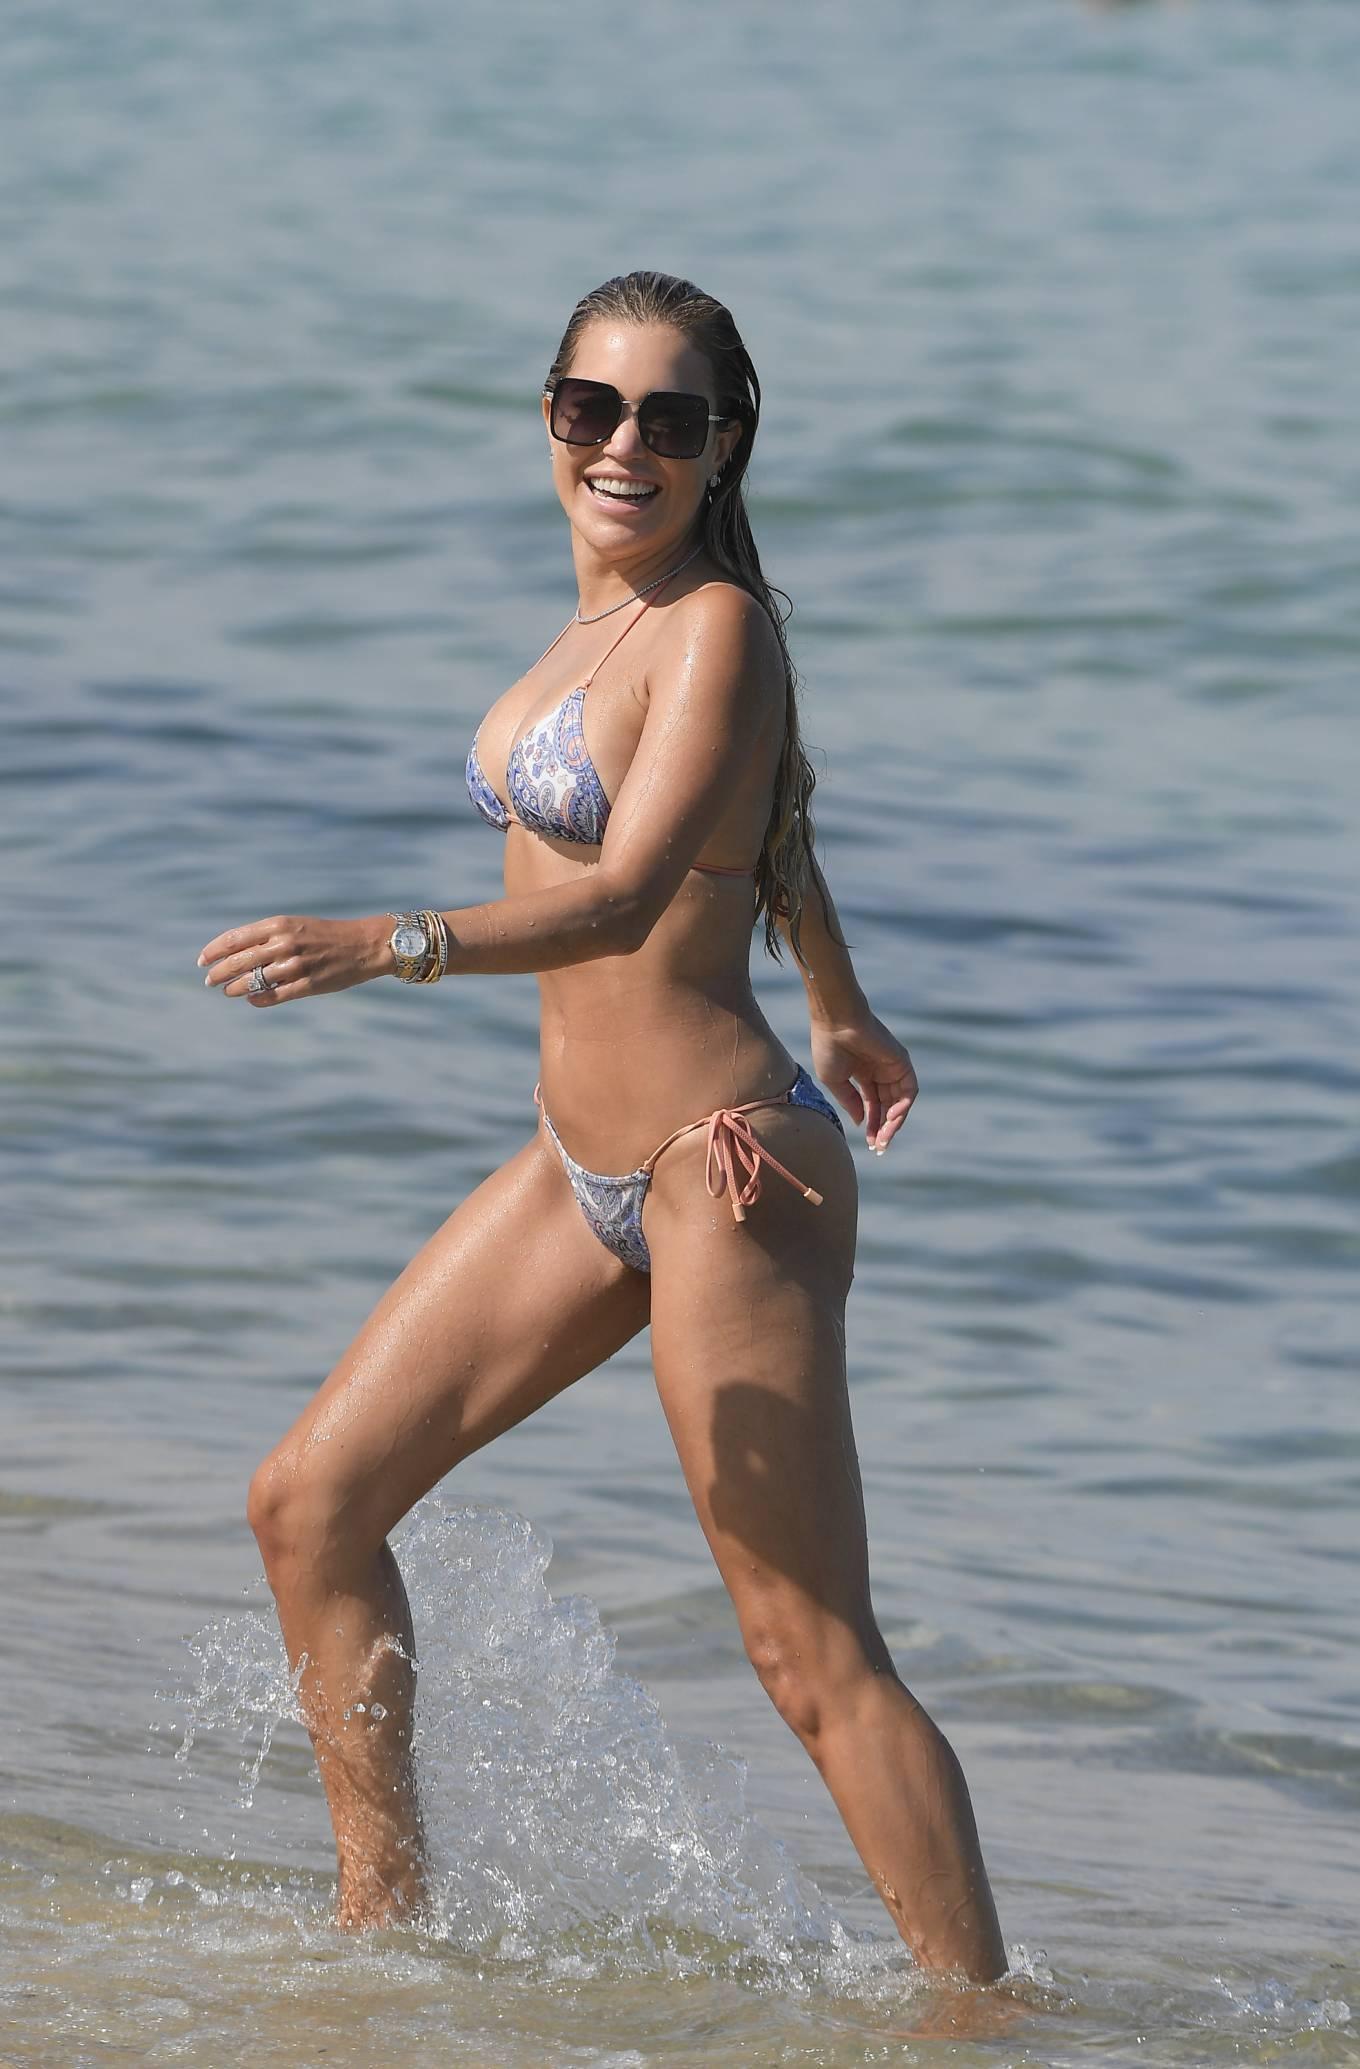 Sylvie Meis 2021 : Sylvie Meis – In a bikini with her husband Niclas Castello on the beach La Réserve in Ramatuelle-04